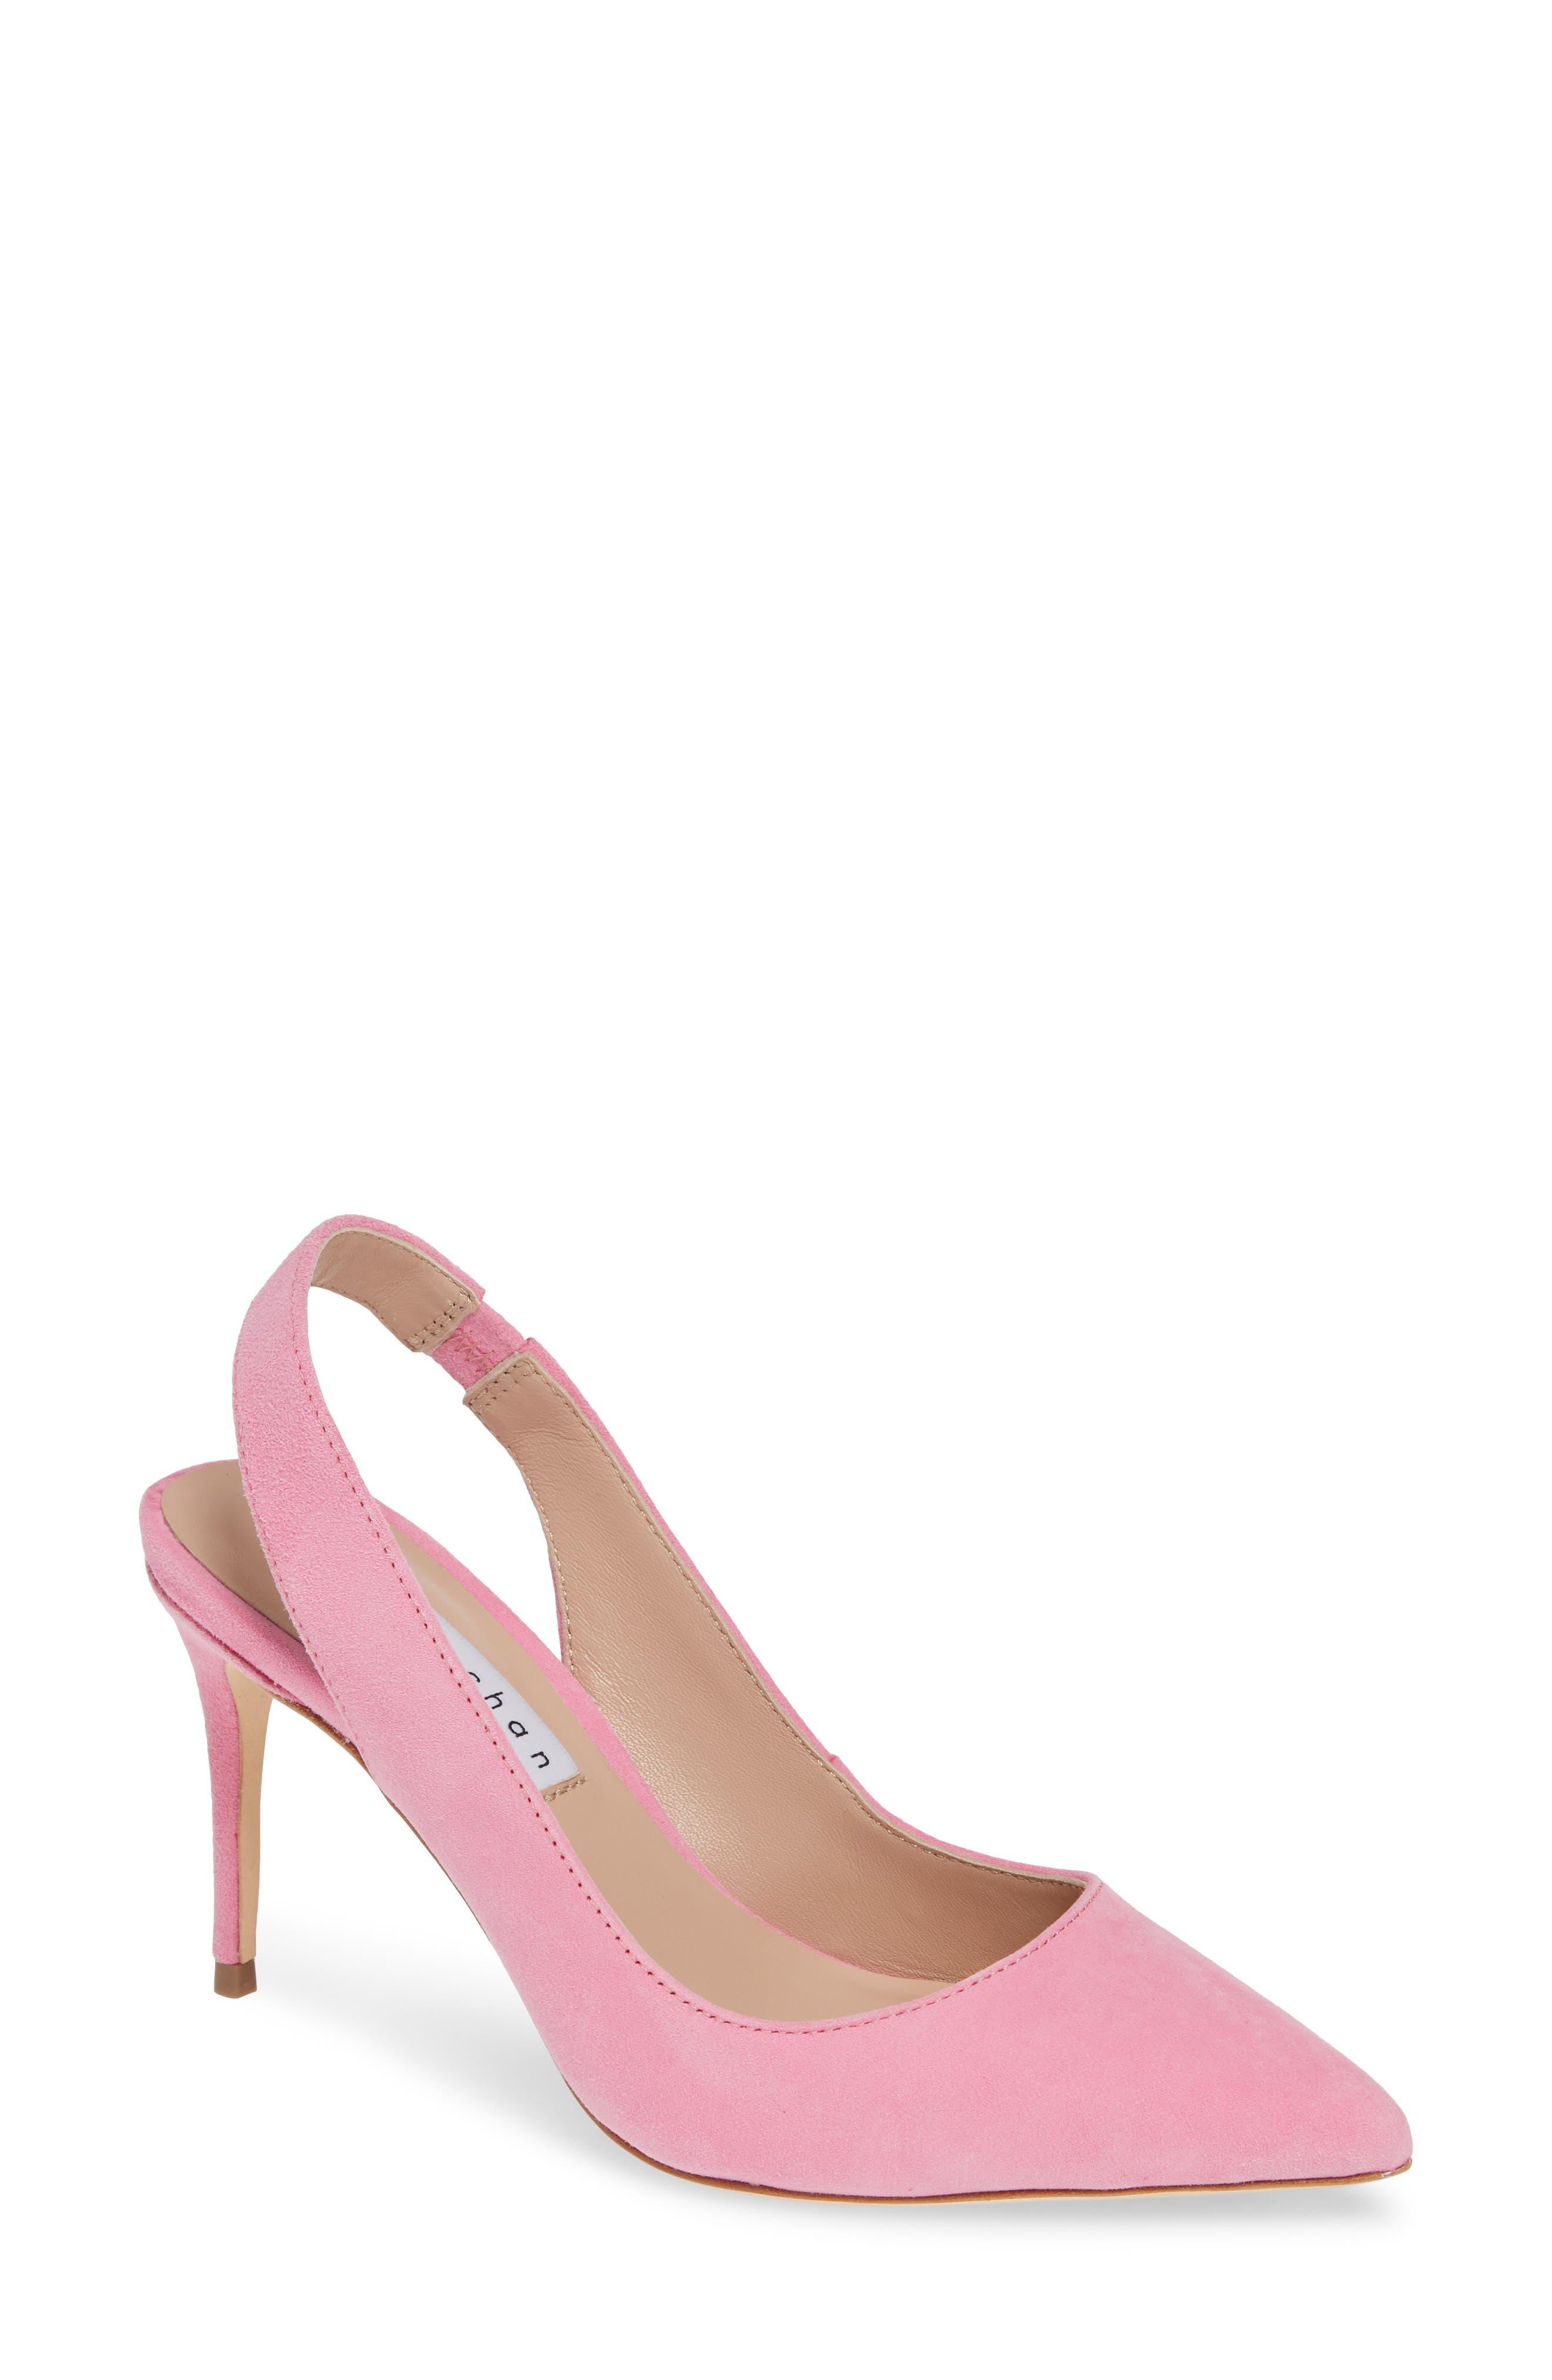 pink pumps | Nordstrom